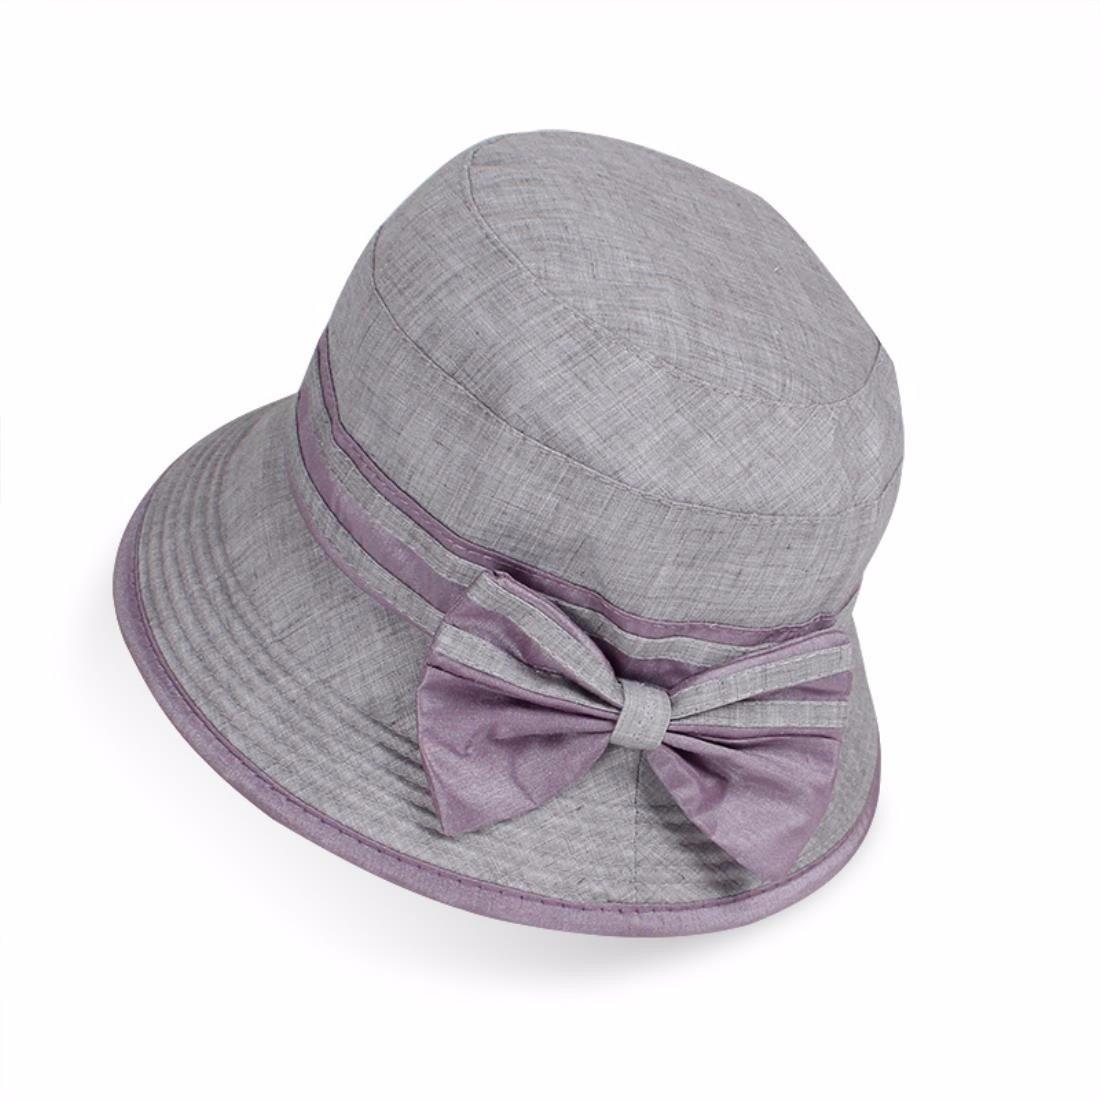 QIER-MZ Casquillo De La Mujer Casquillo del Verano del Resorte Casquillo De  La Ropa Sombrero De Fisher Sombrero del Cuenco Sombrero De Copa Casquillo  De La ... 1947c3d2111